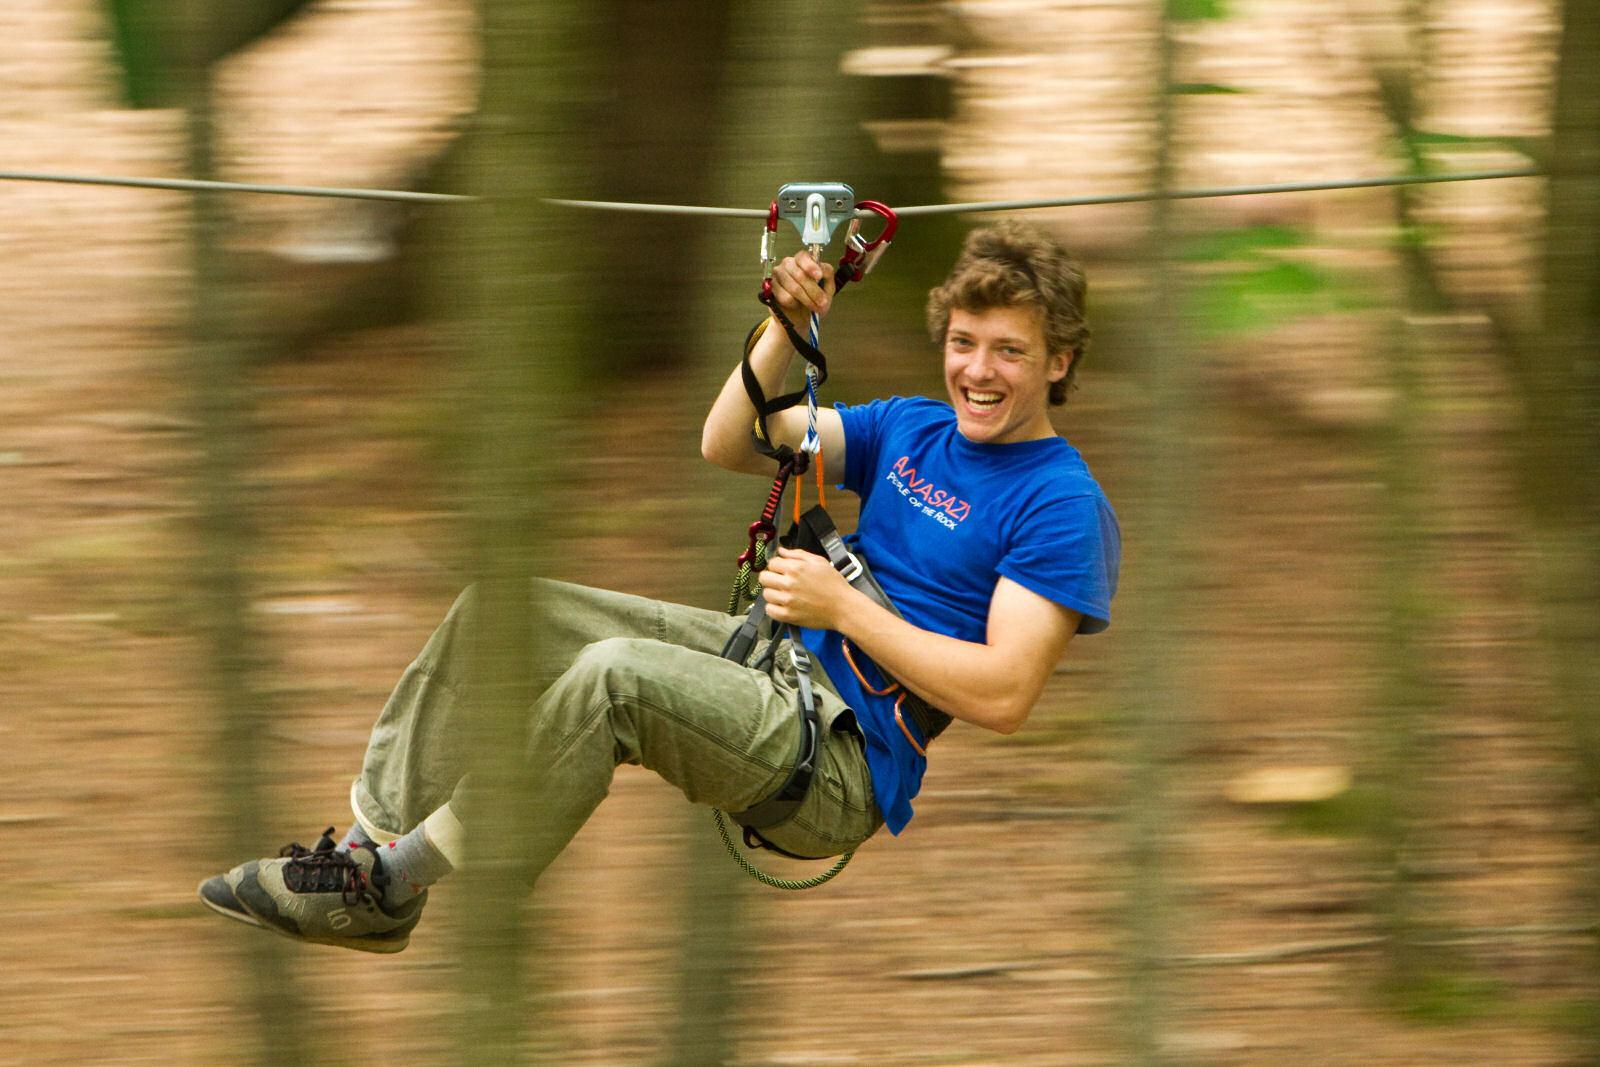 adventure-park-bled-04-slovenia